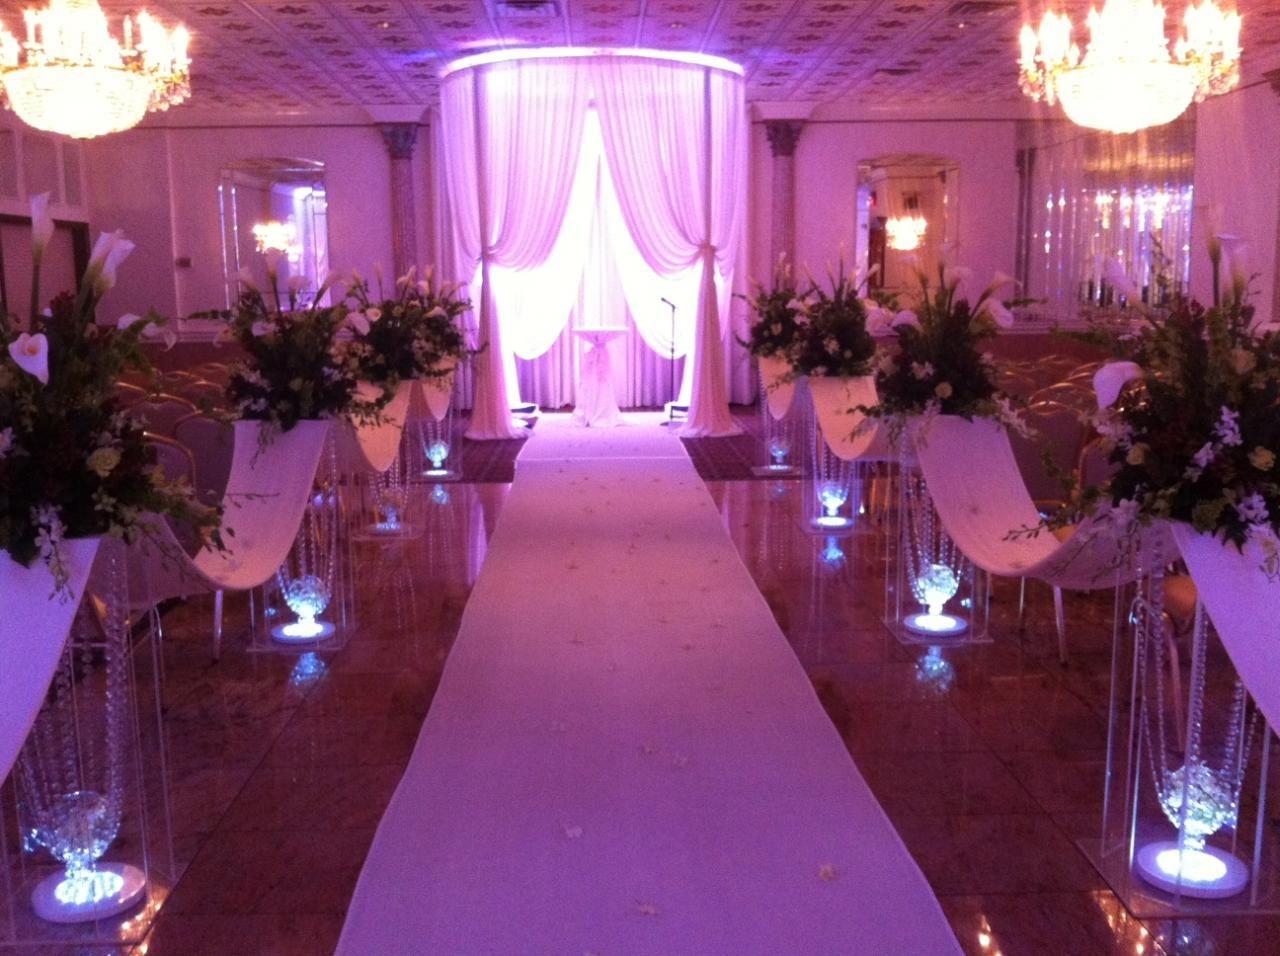 Wedding: Aisle Columns